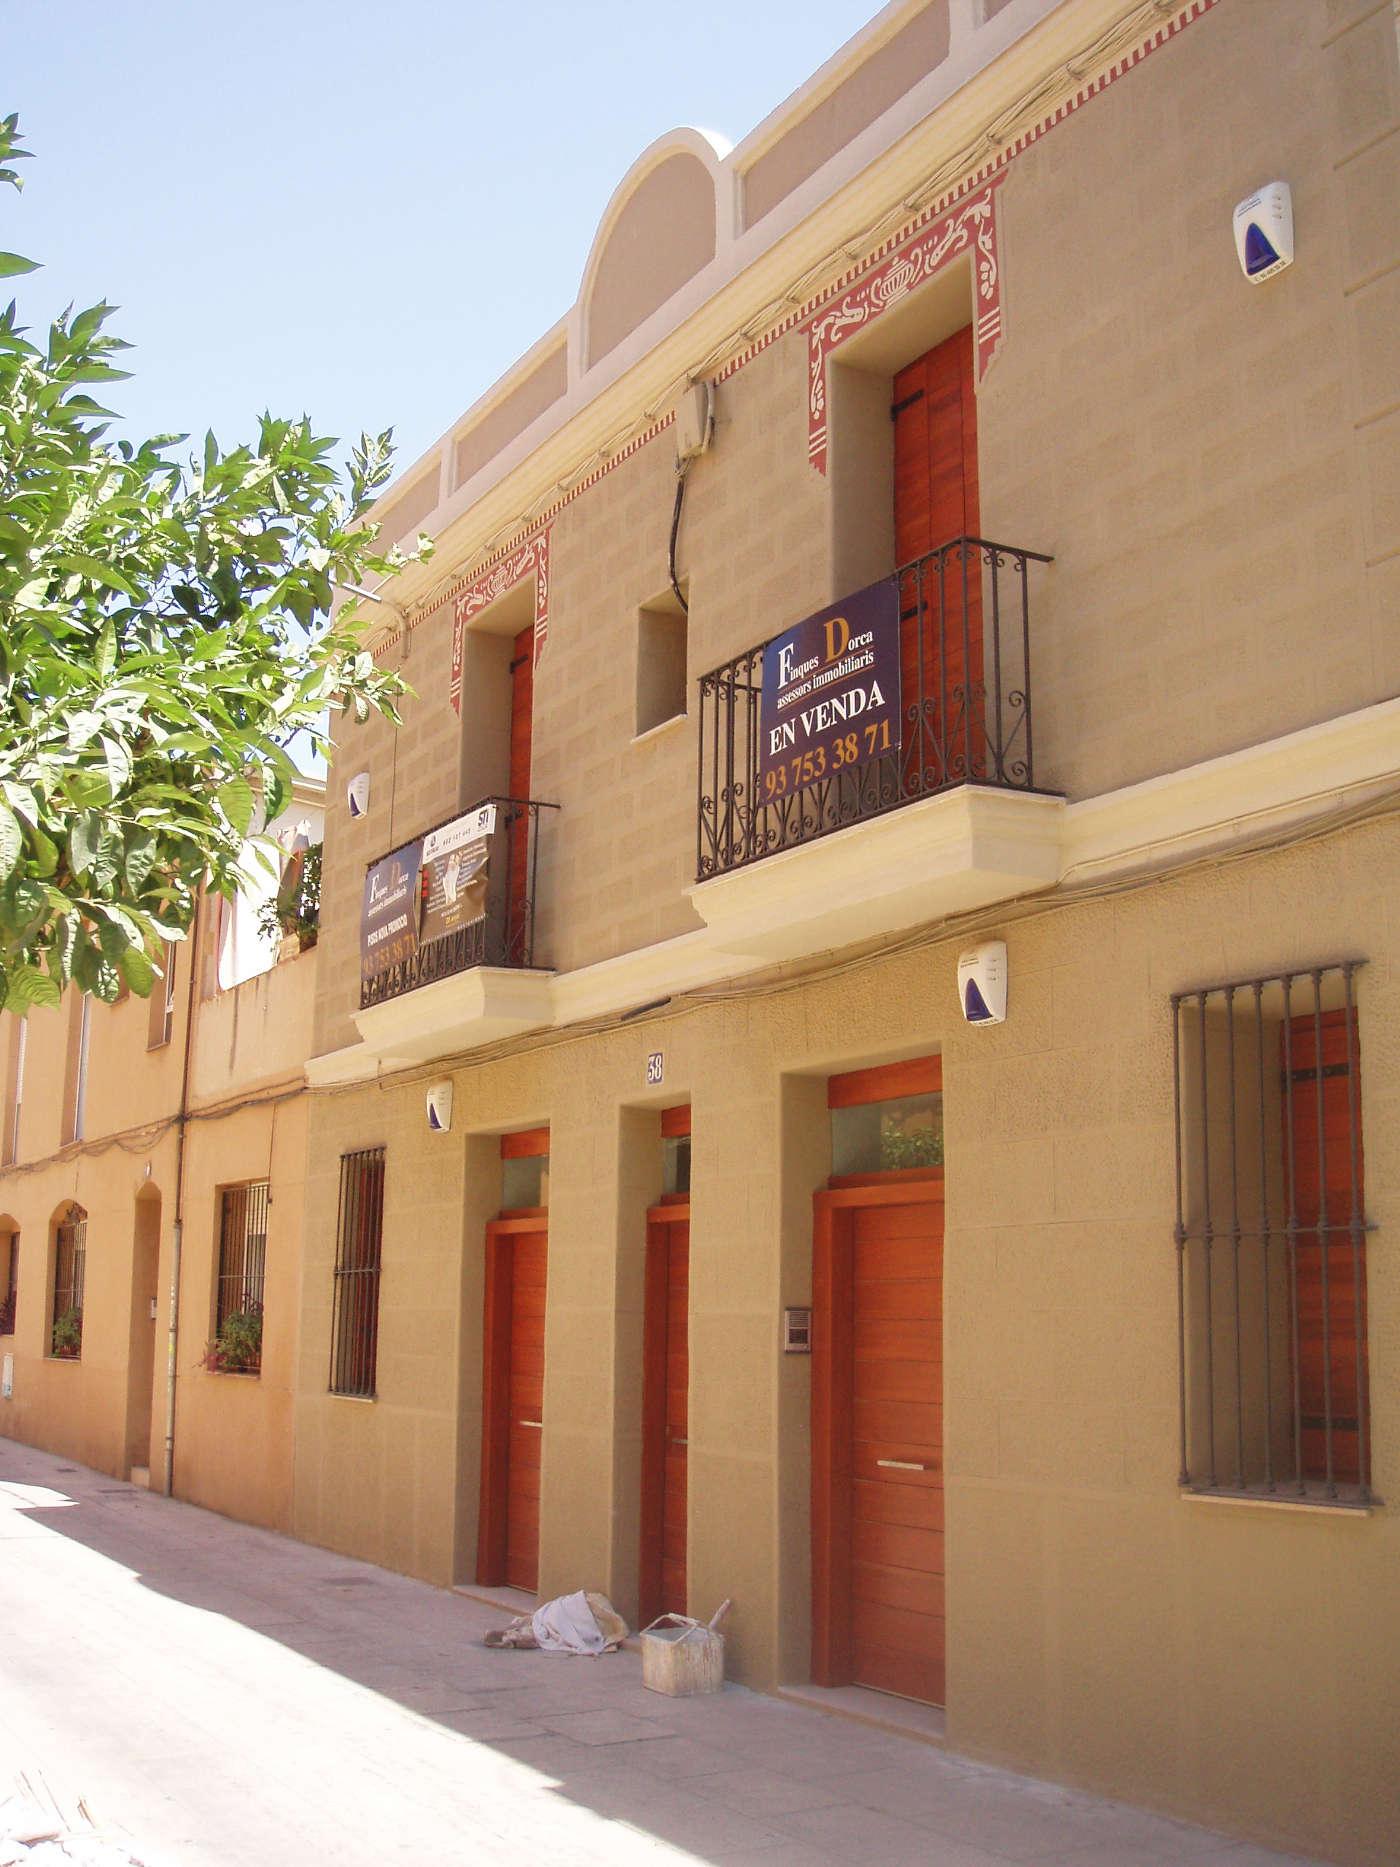 diseño viviendas poble nou, gloria duran, arquitecto barcelona